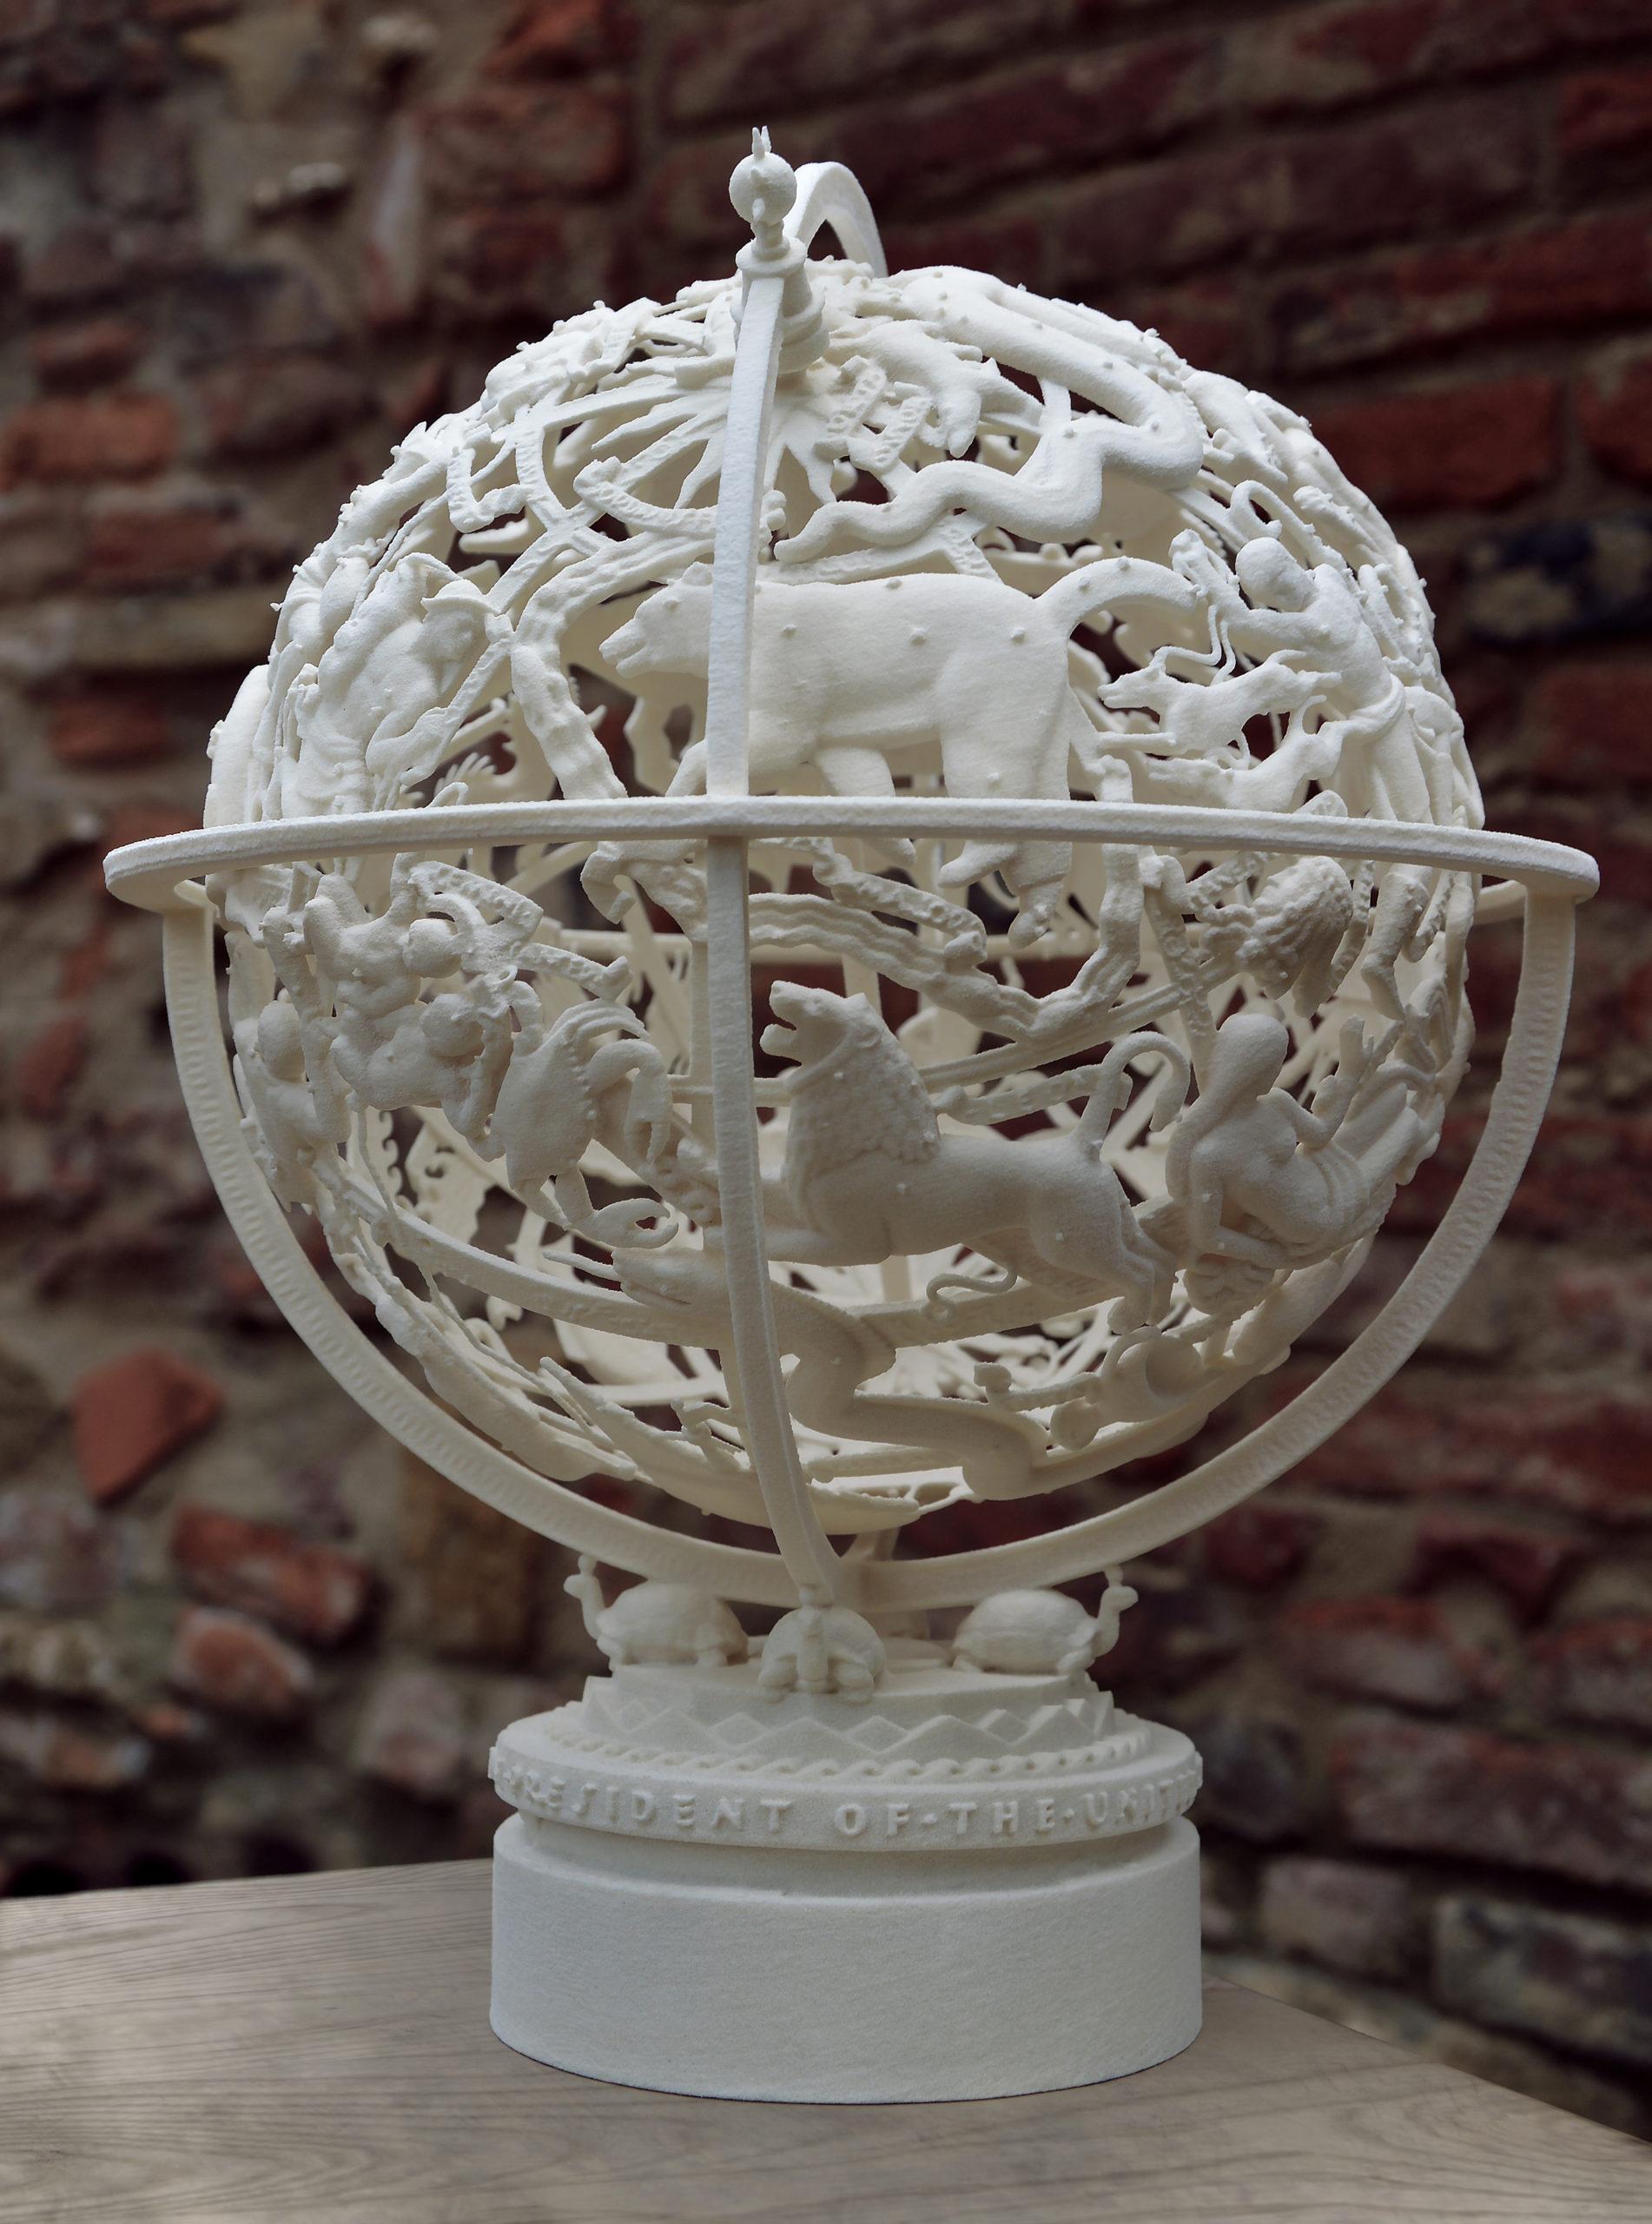 3D model of the Sphere.© DIMENSIO